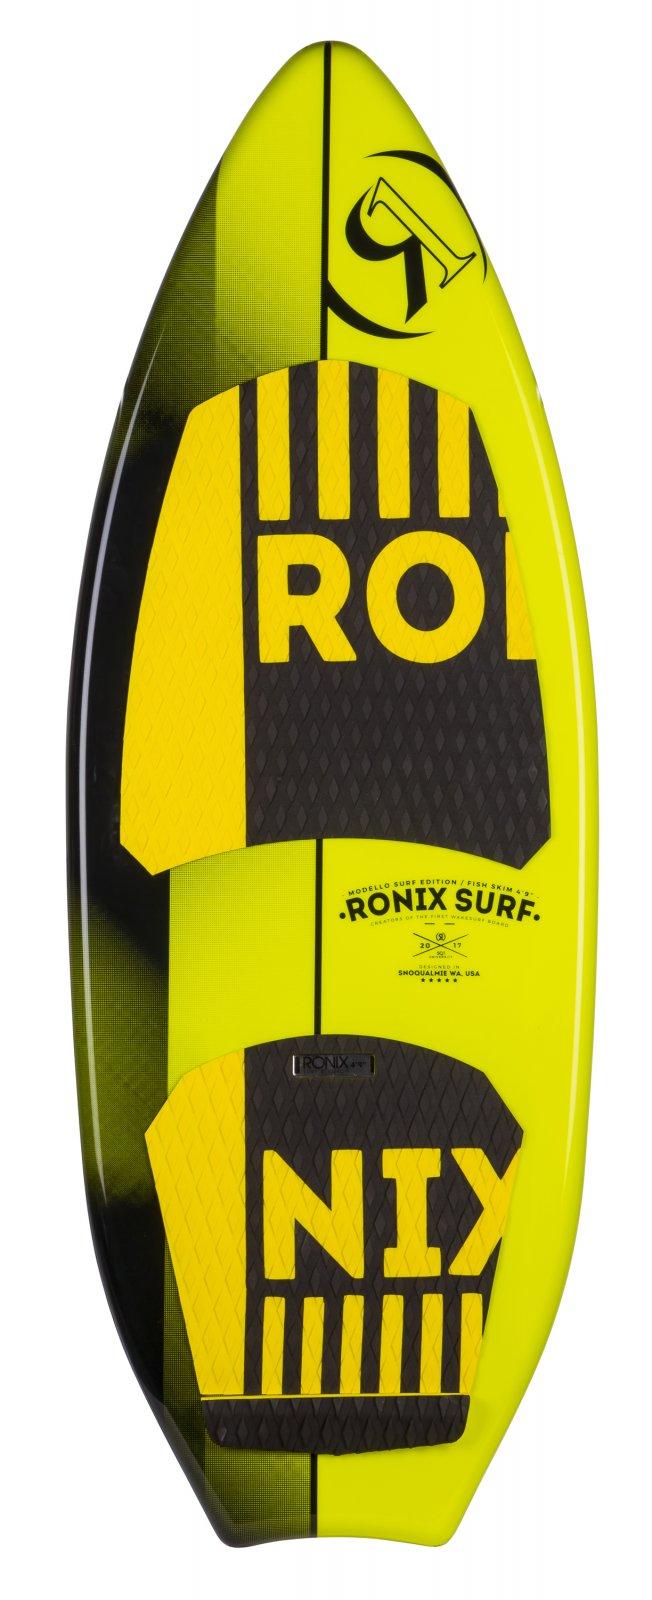 2017 RONIX MODELLO SURF EDITION FISH SKIM